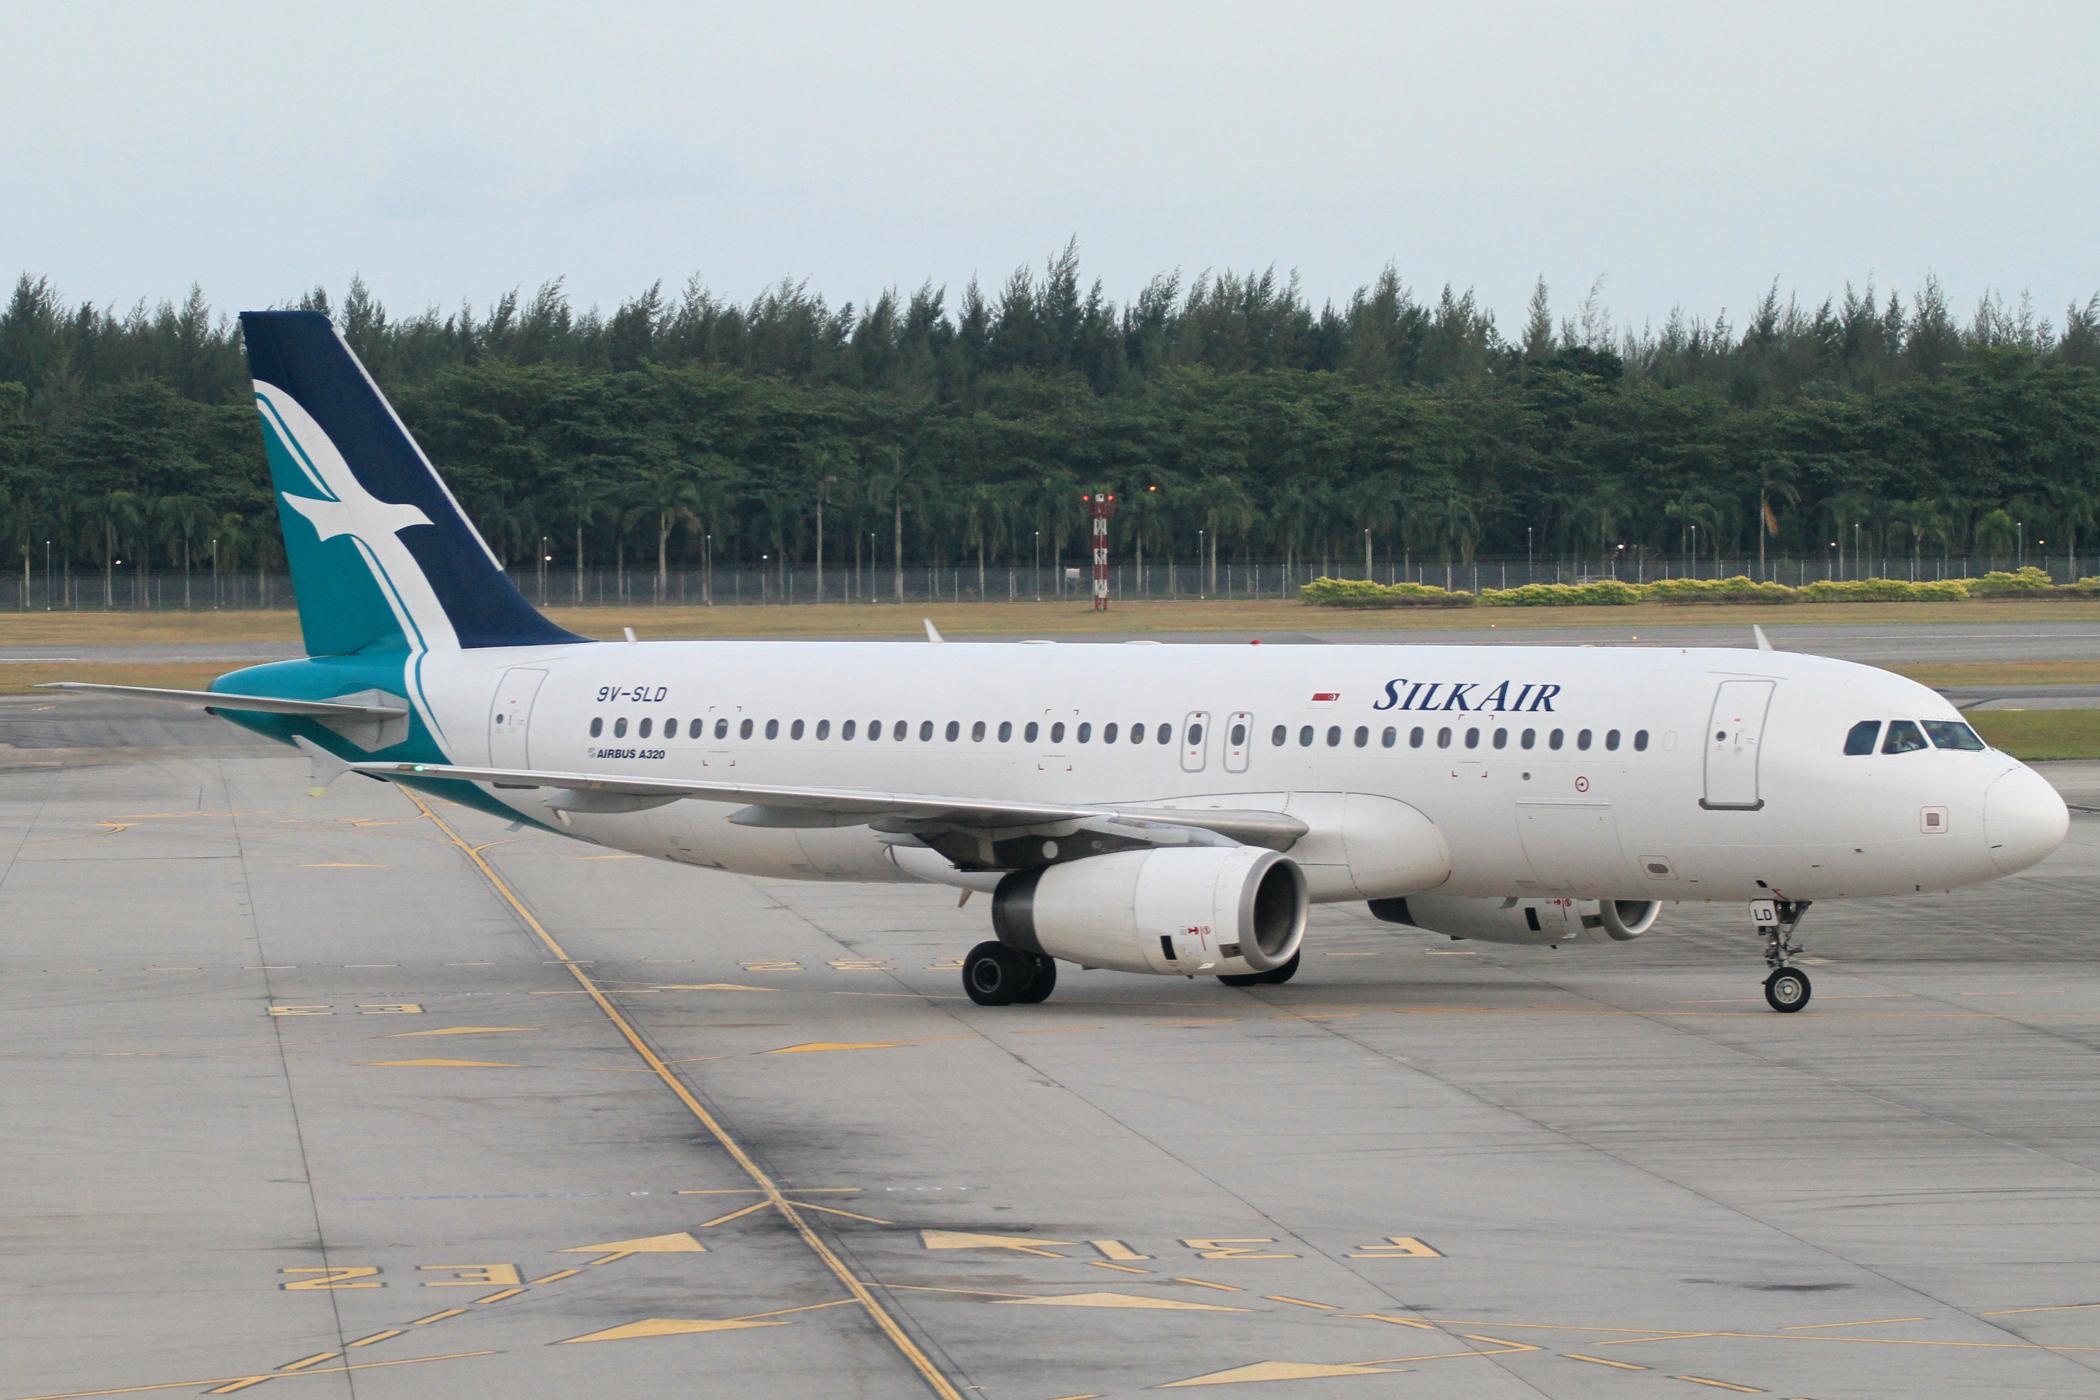 En Airbus A320-200 fra SilkAir i Singapore Changi Airport. Foto: Kentaro Iemoto